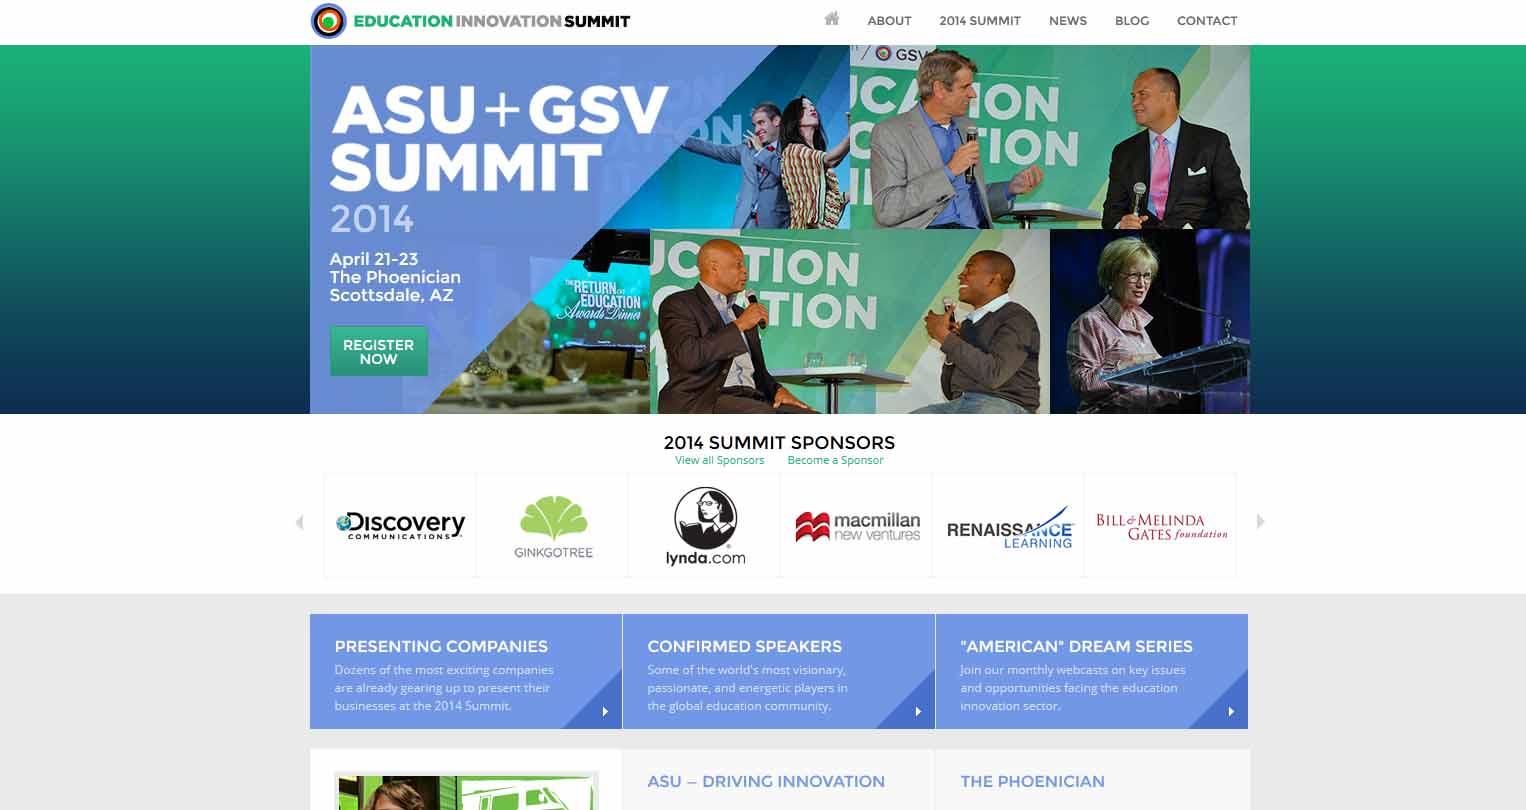 Education Innovation Summit 2014.jpg